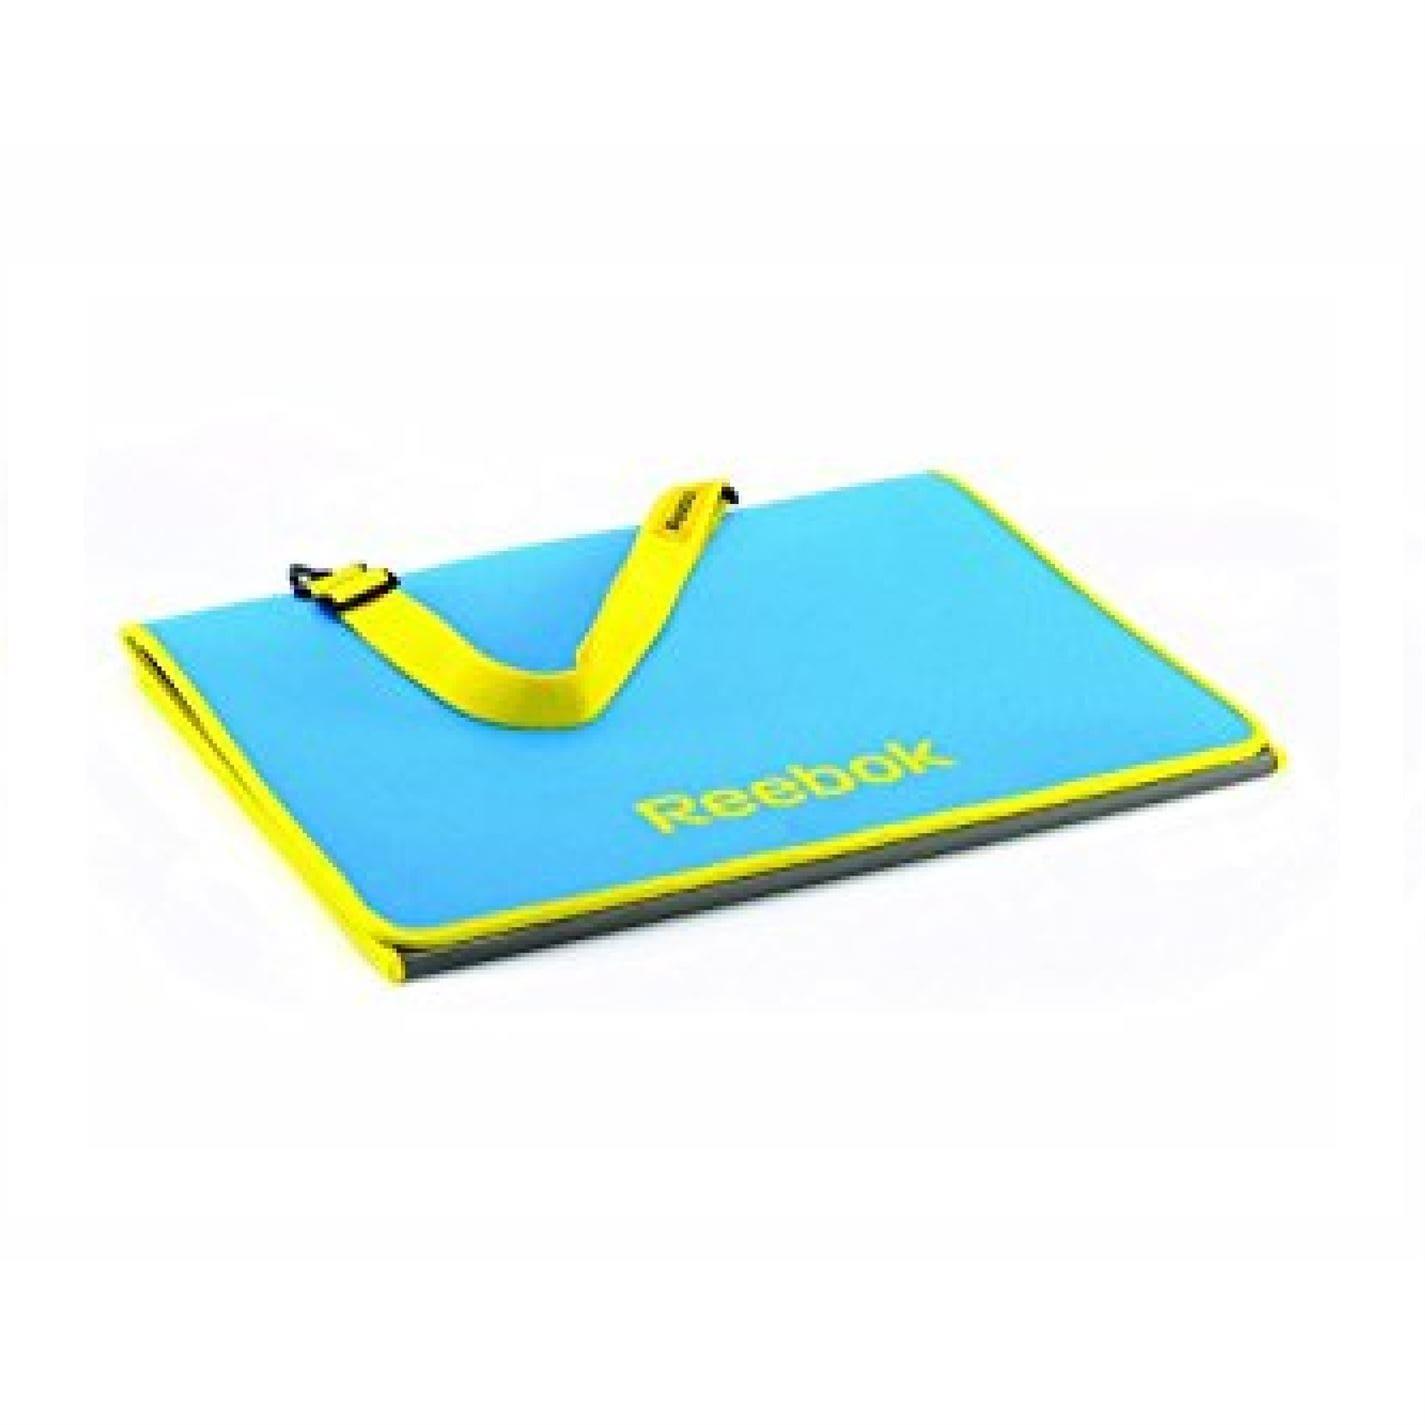 Reebok TriFord Fitness Mat